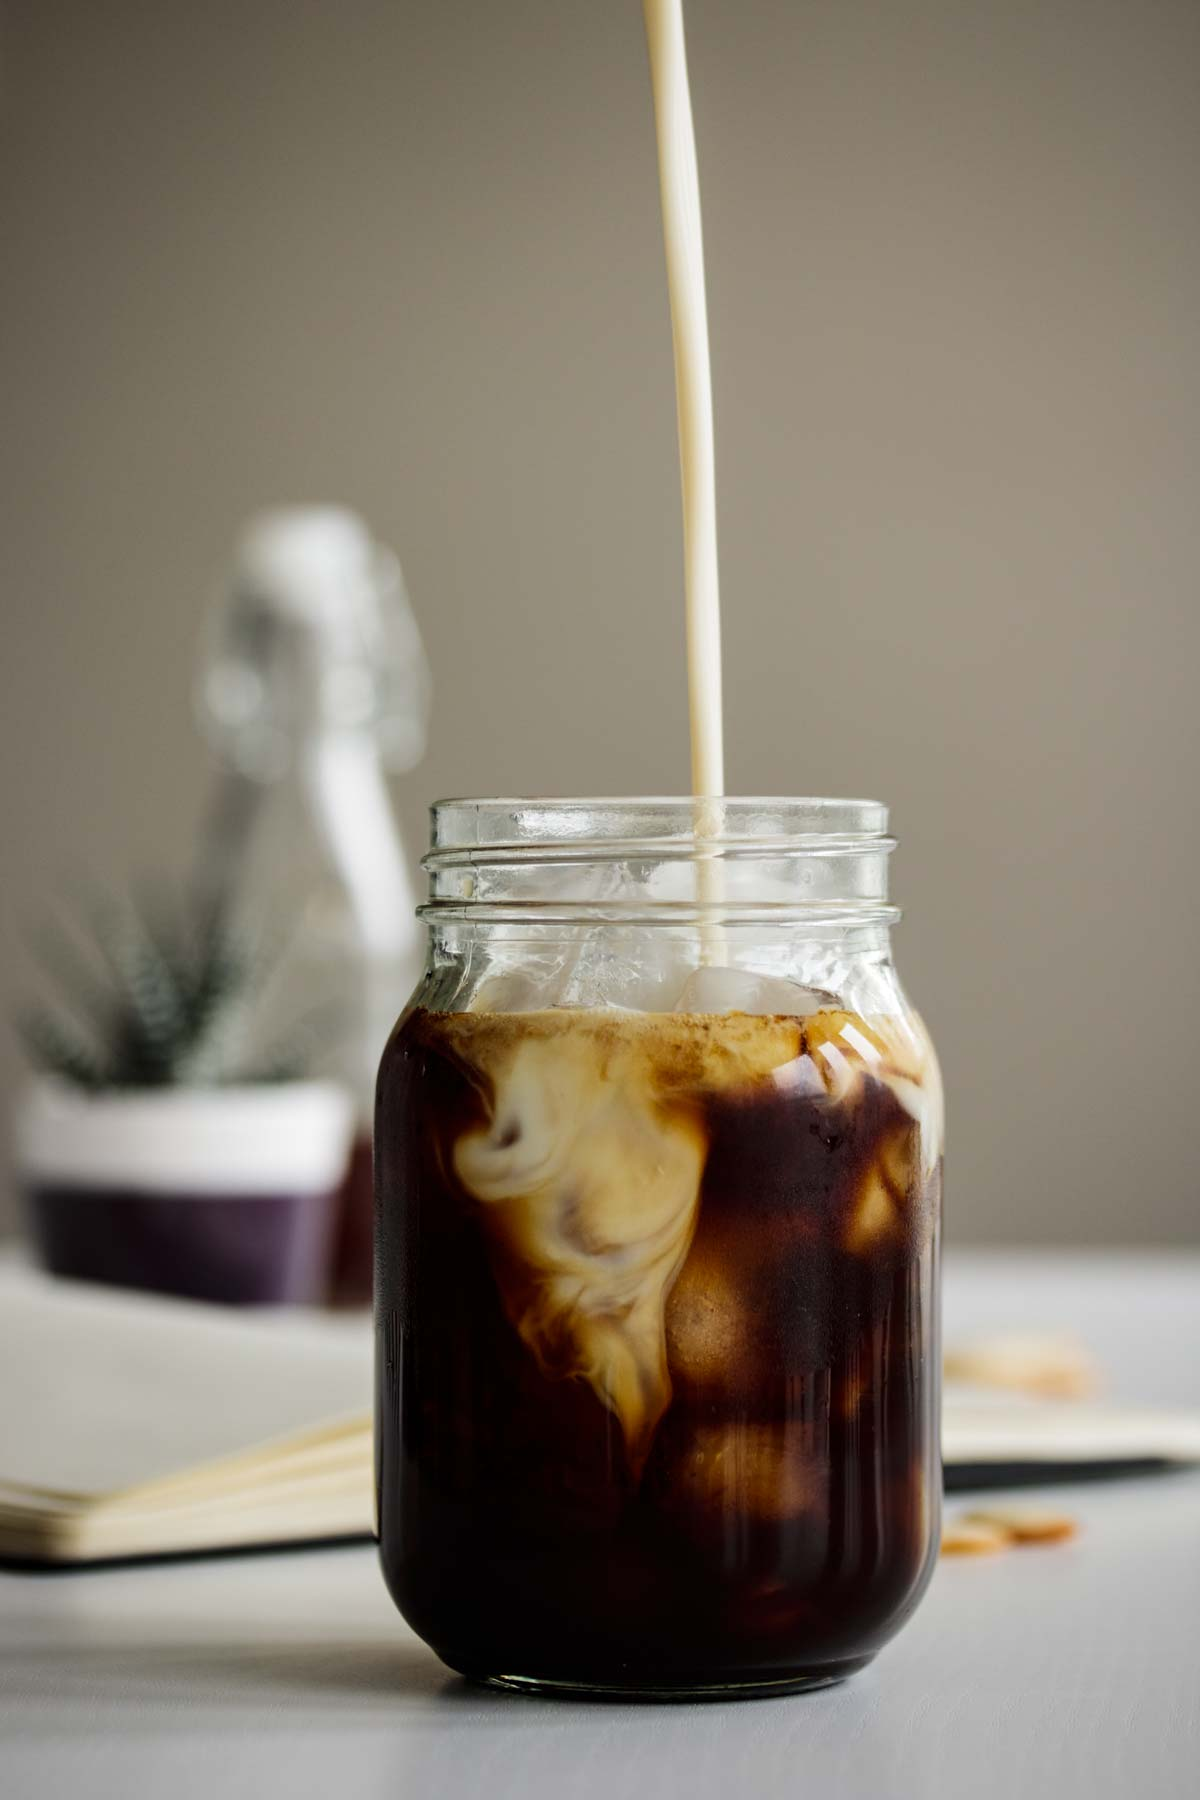 Oat milk pouring into shaken espresso.